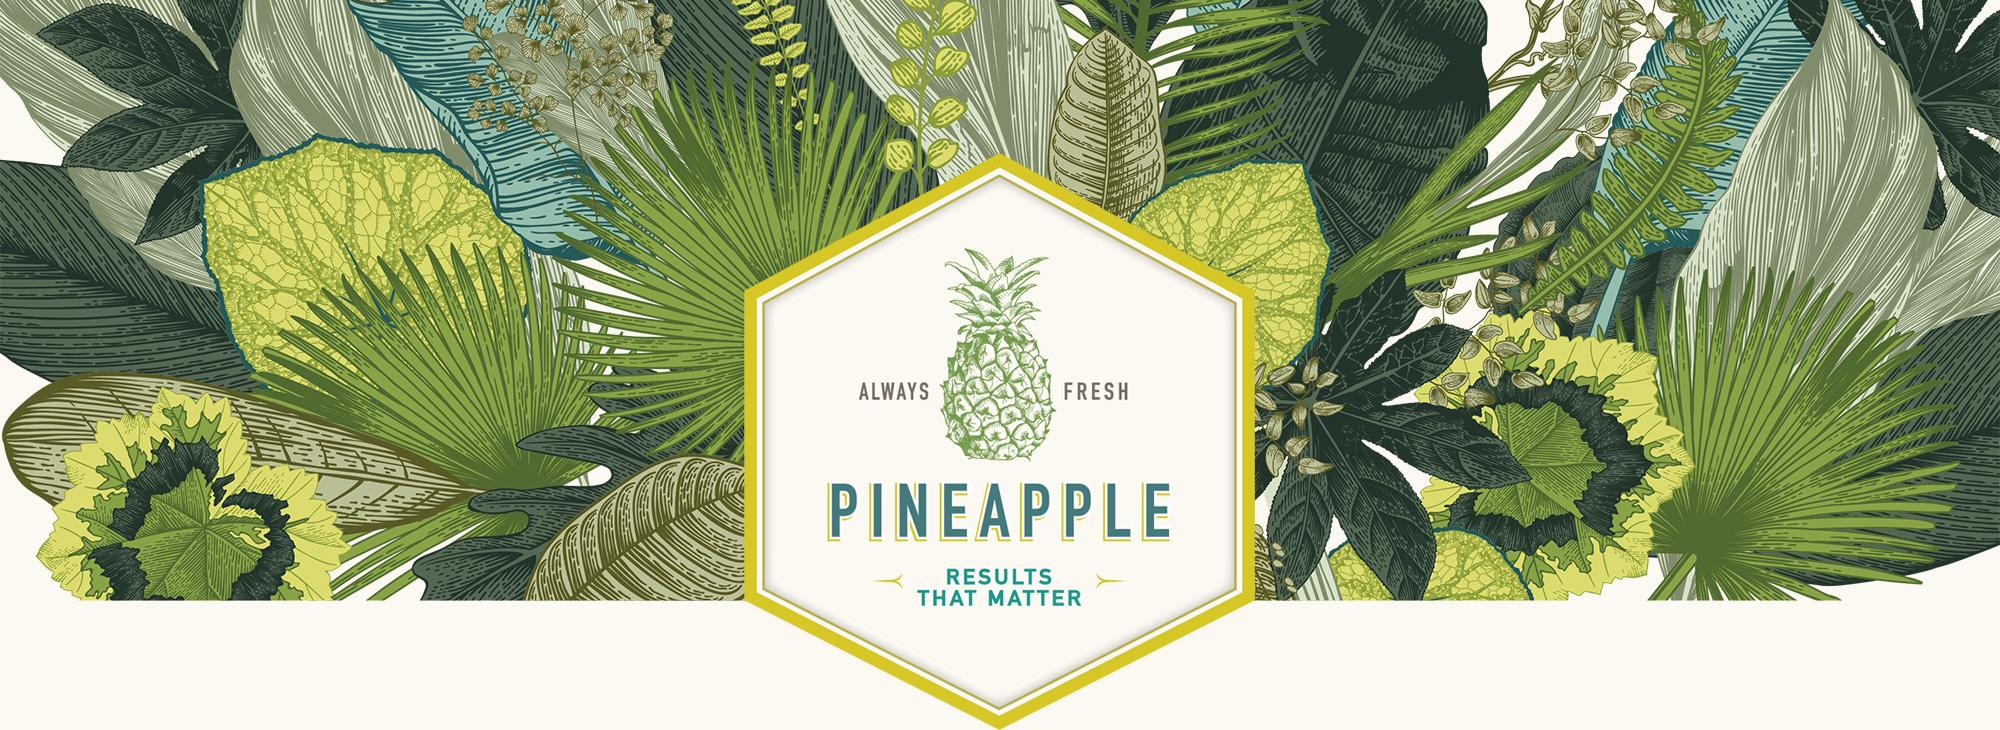 pineapple-floral-full-big-lite.jpg